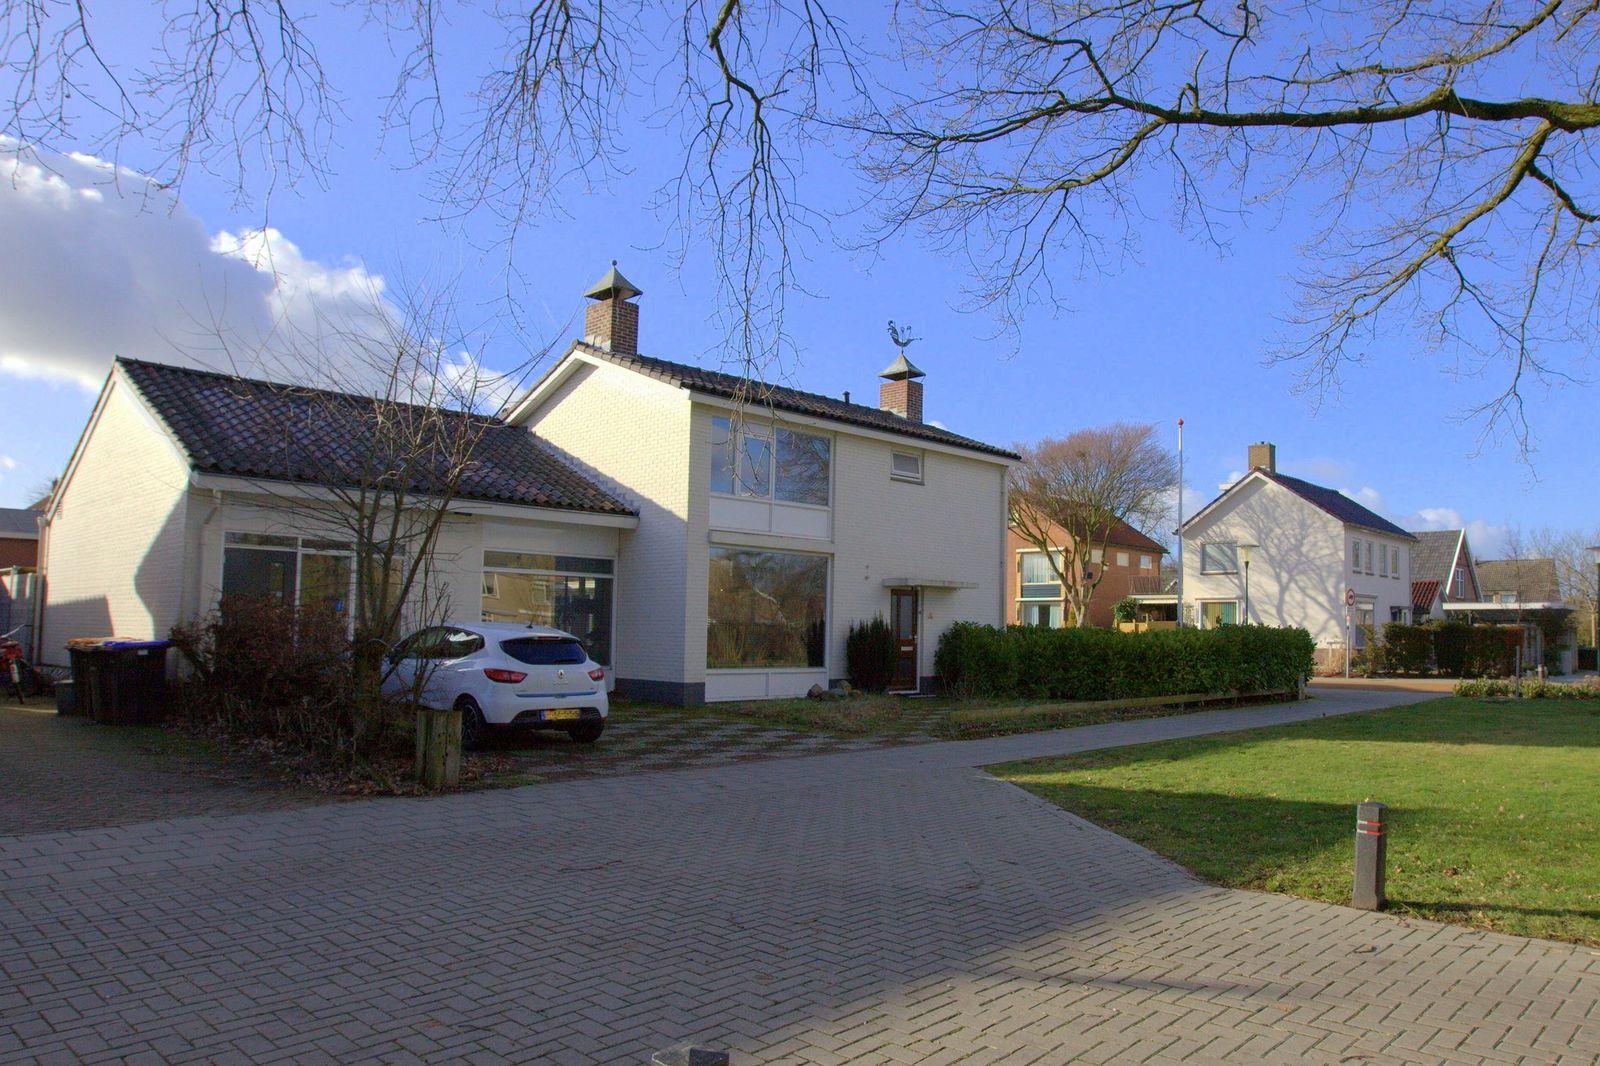 Ravenhorsterweg 75, Winterswijk